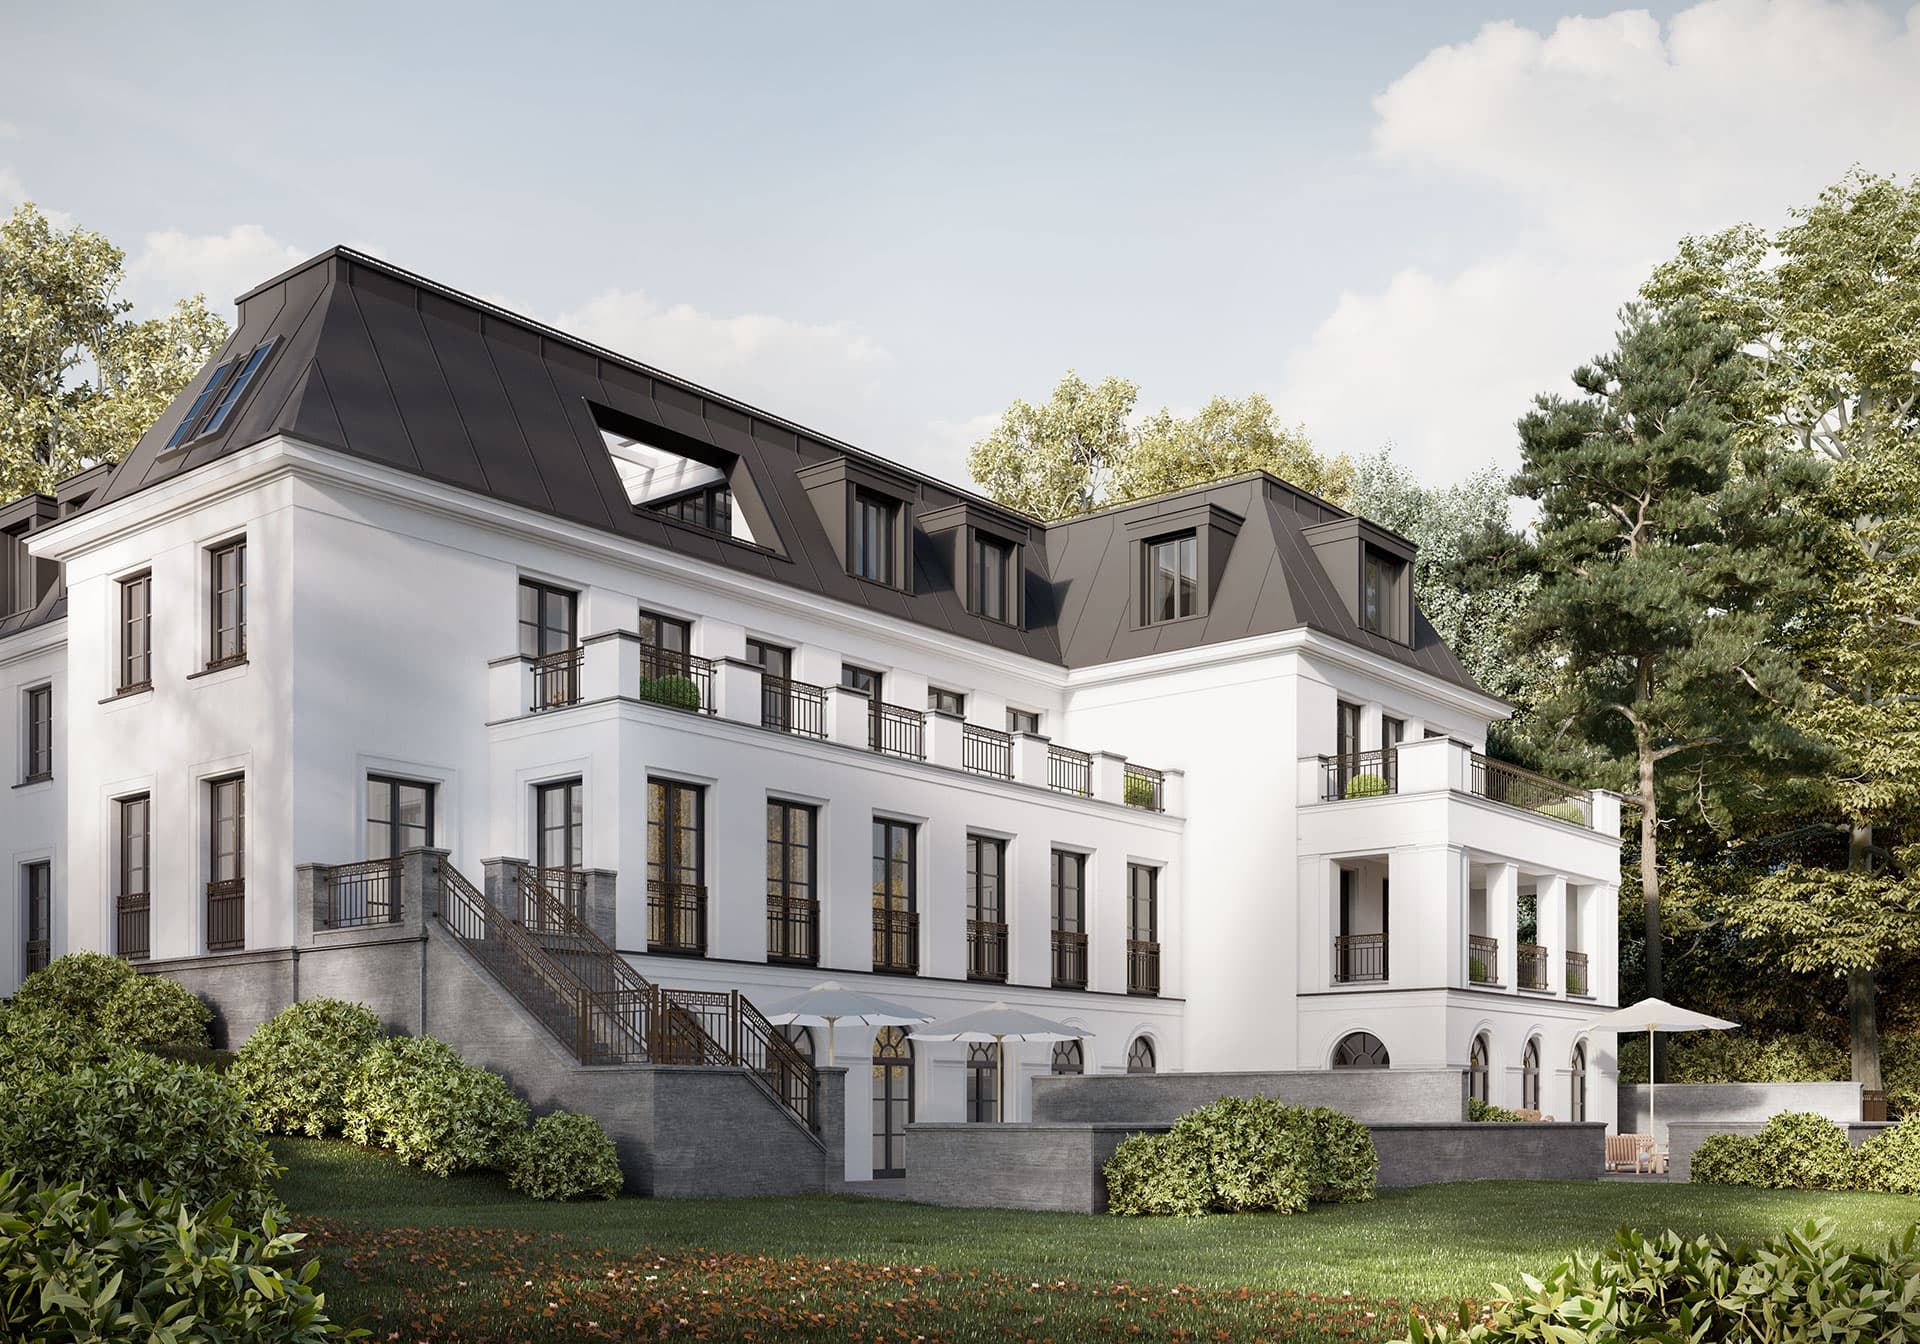 Haus-Bennett Gartenansicht Berlin-Grunewald Gartenansicht